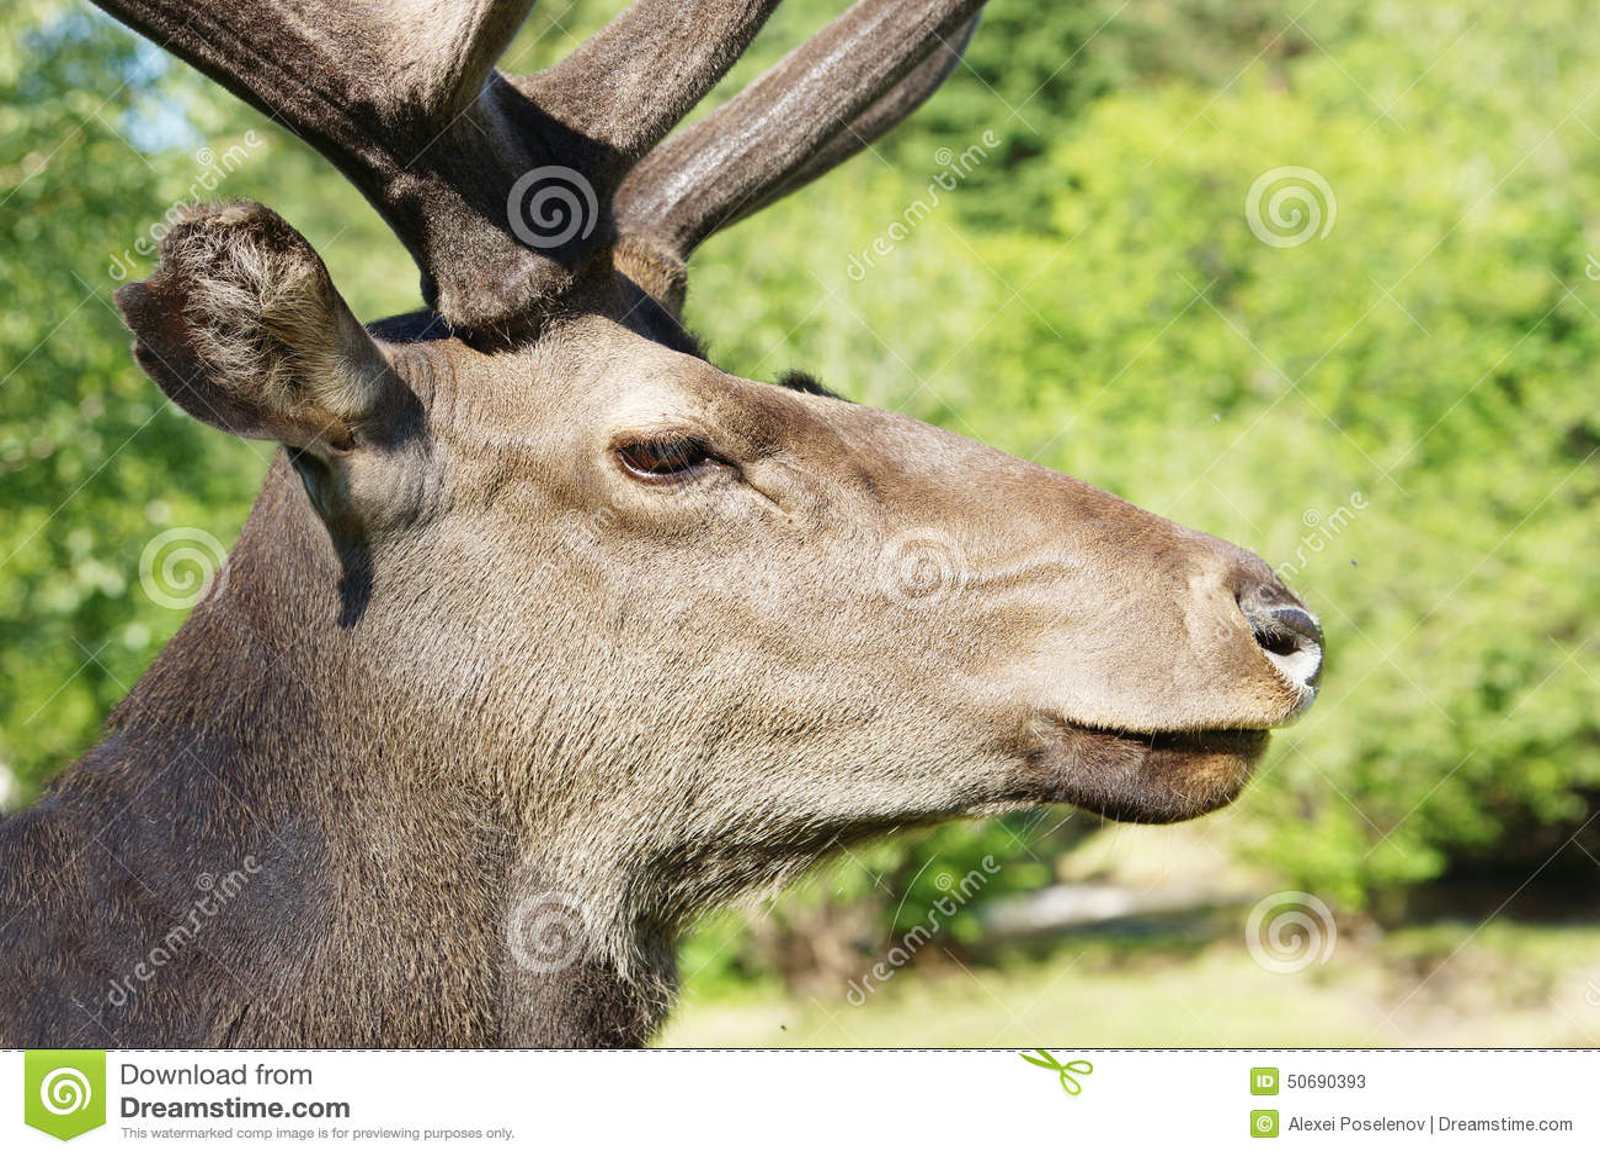 Download 反对绿色叶子的野生马鹿 库存图片. 图片 包括有 自然, 红色, 夏天, 西伯利亚, 成块, 晴朗, 通配 - 50690393